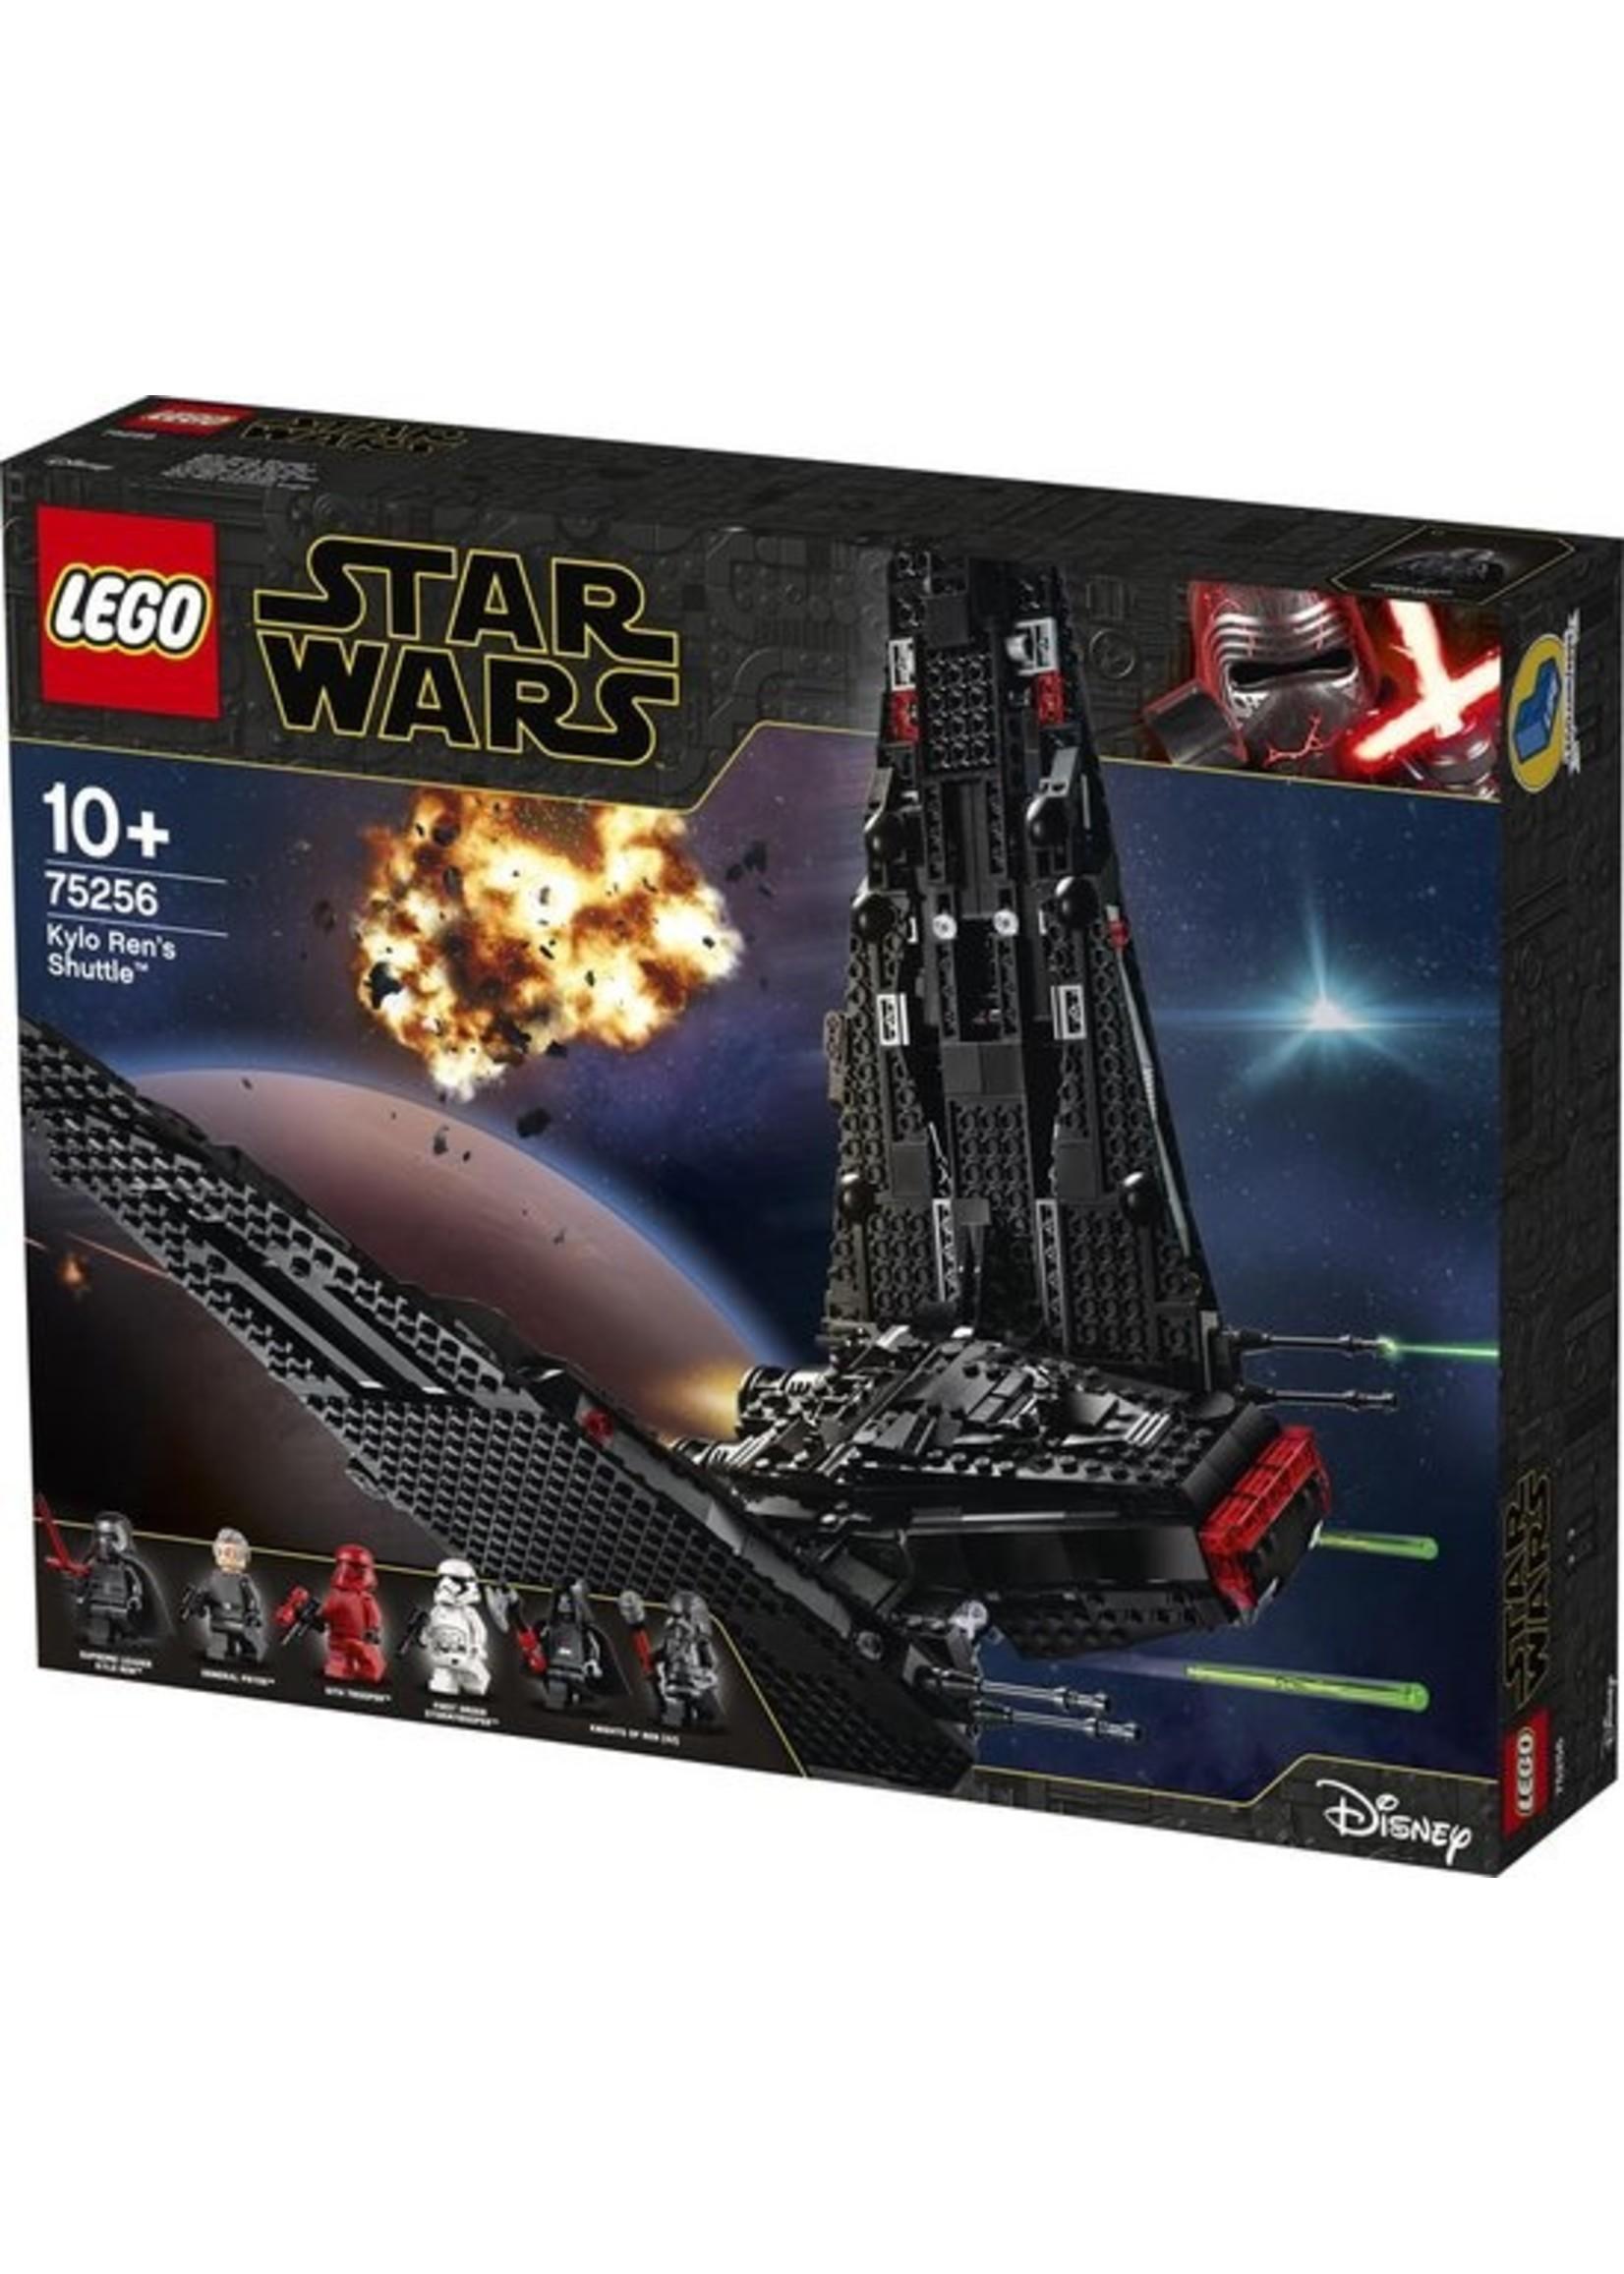 Lego LEGO Star Wars Kylo Ren's Shuttle - 75256